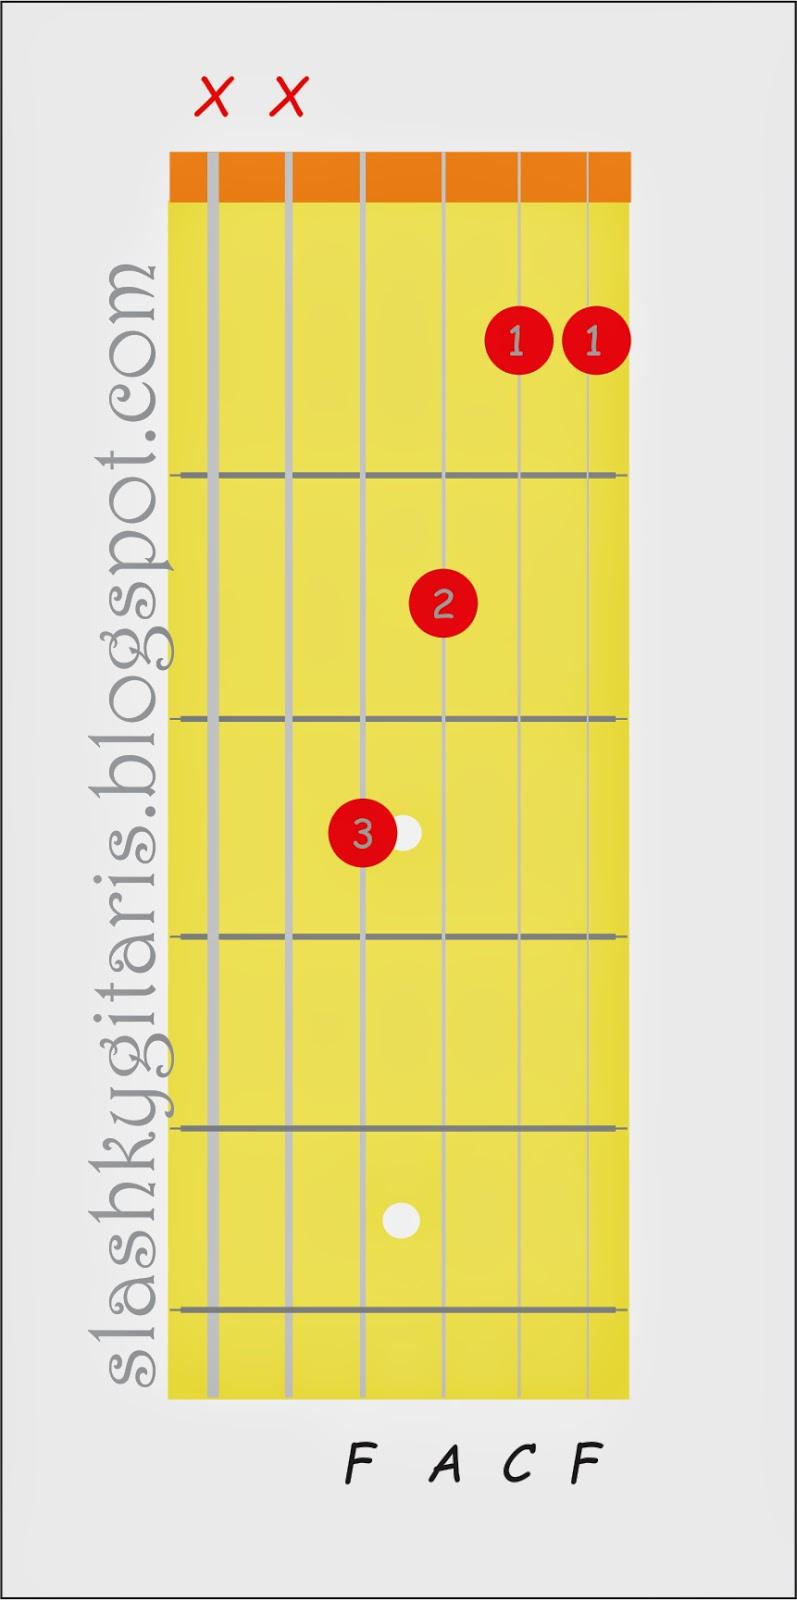 belajar chord gitar, belajar gitar, belajar gitar pemula, belajar kunci gitar, kunci F mayor, kunci gitar,